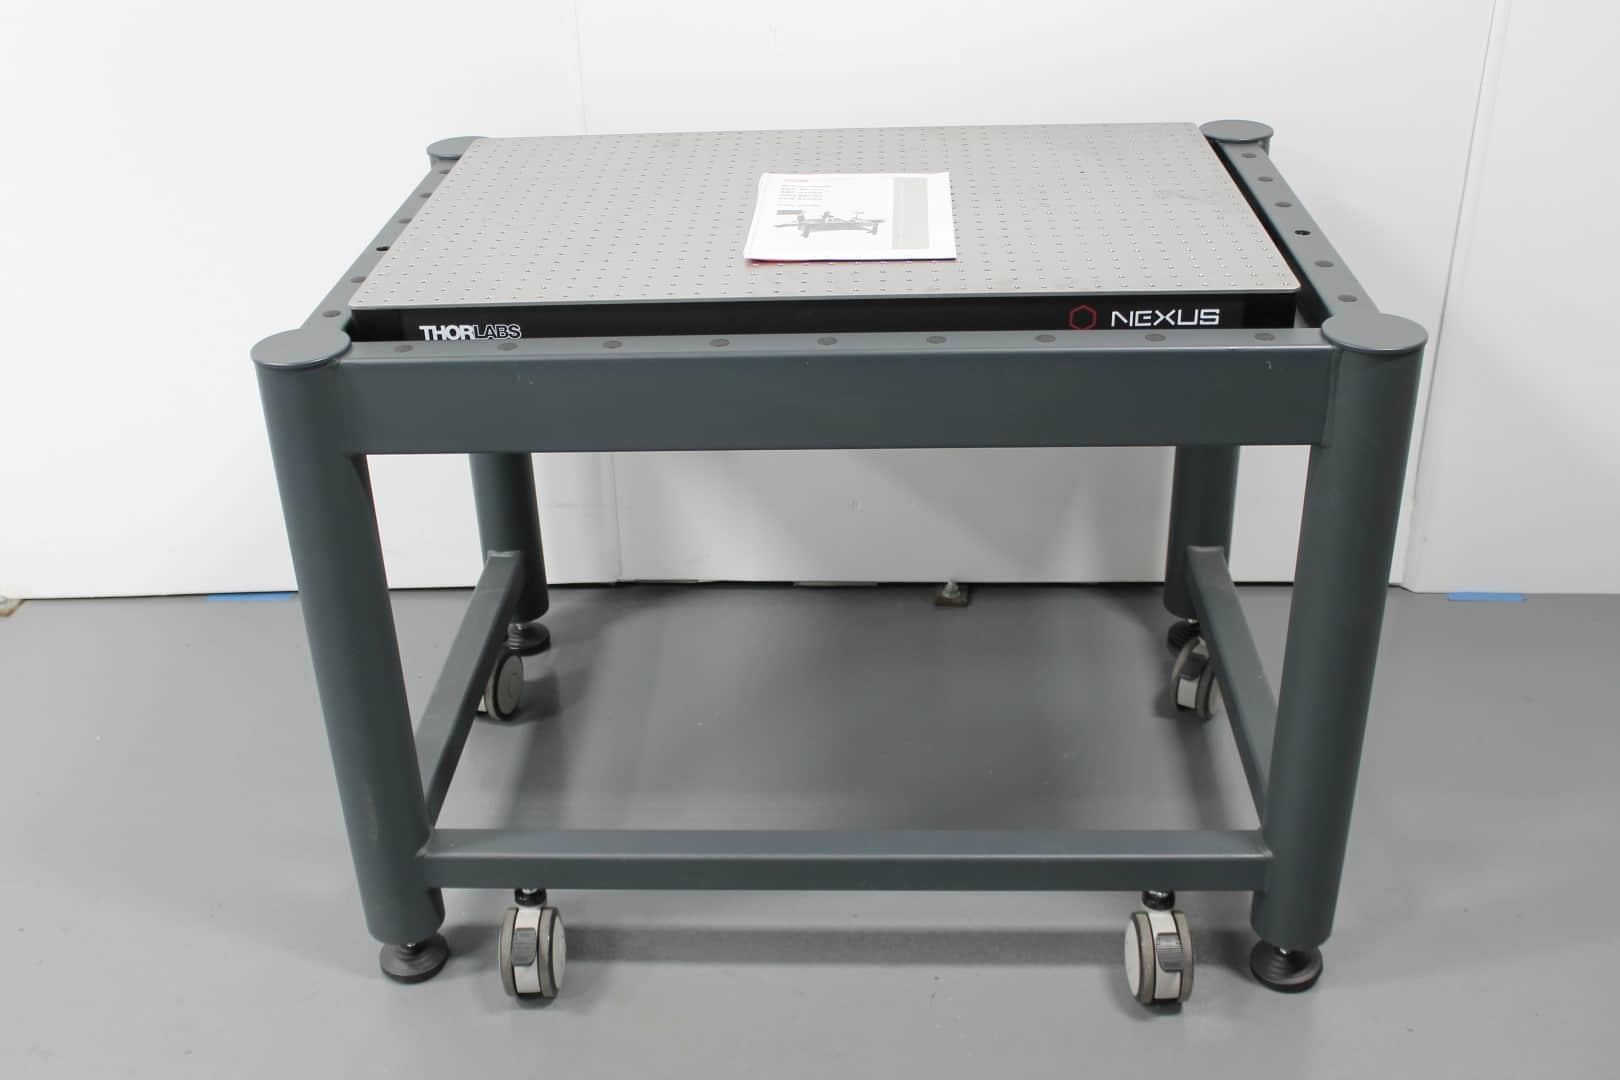 ThorLabs Nexus B2436T Optical Breadboard Table 24x36x2.4in